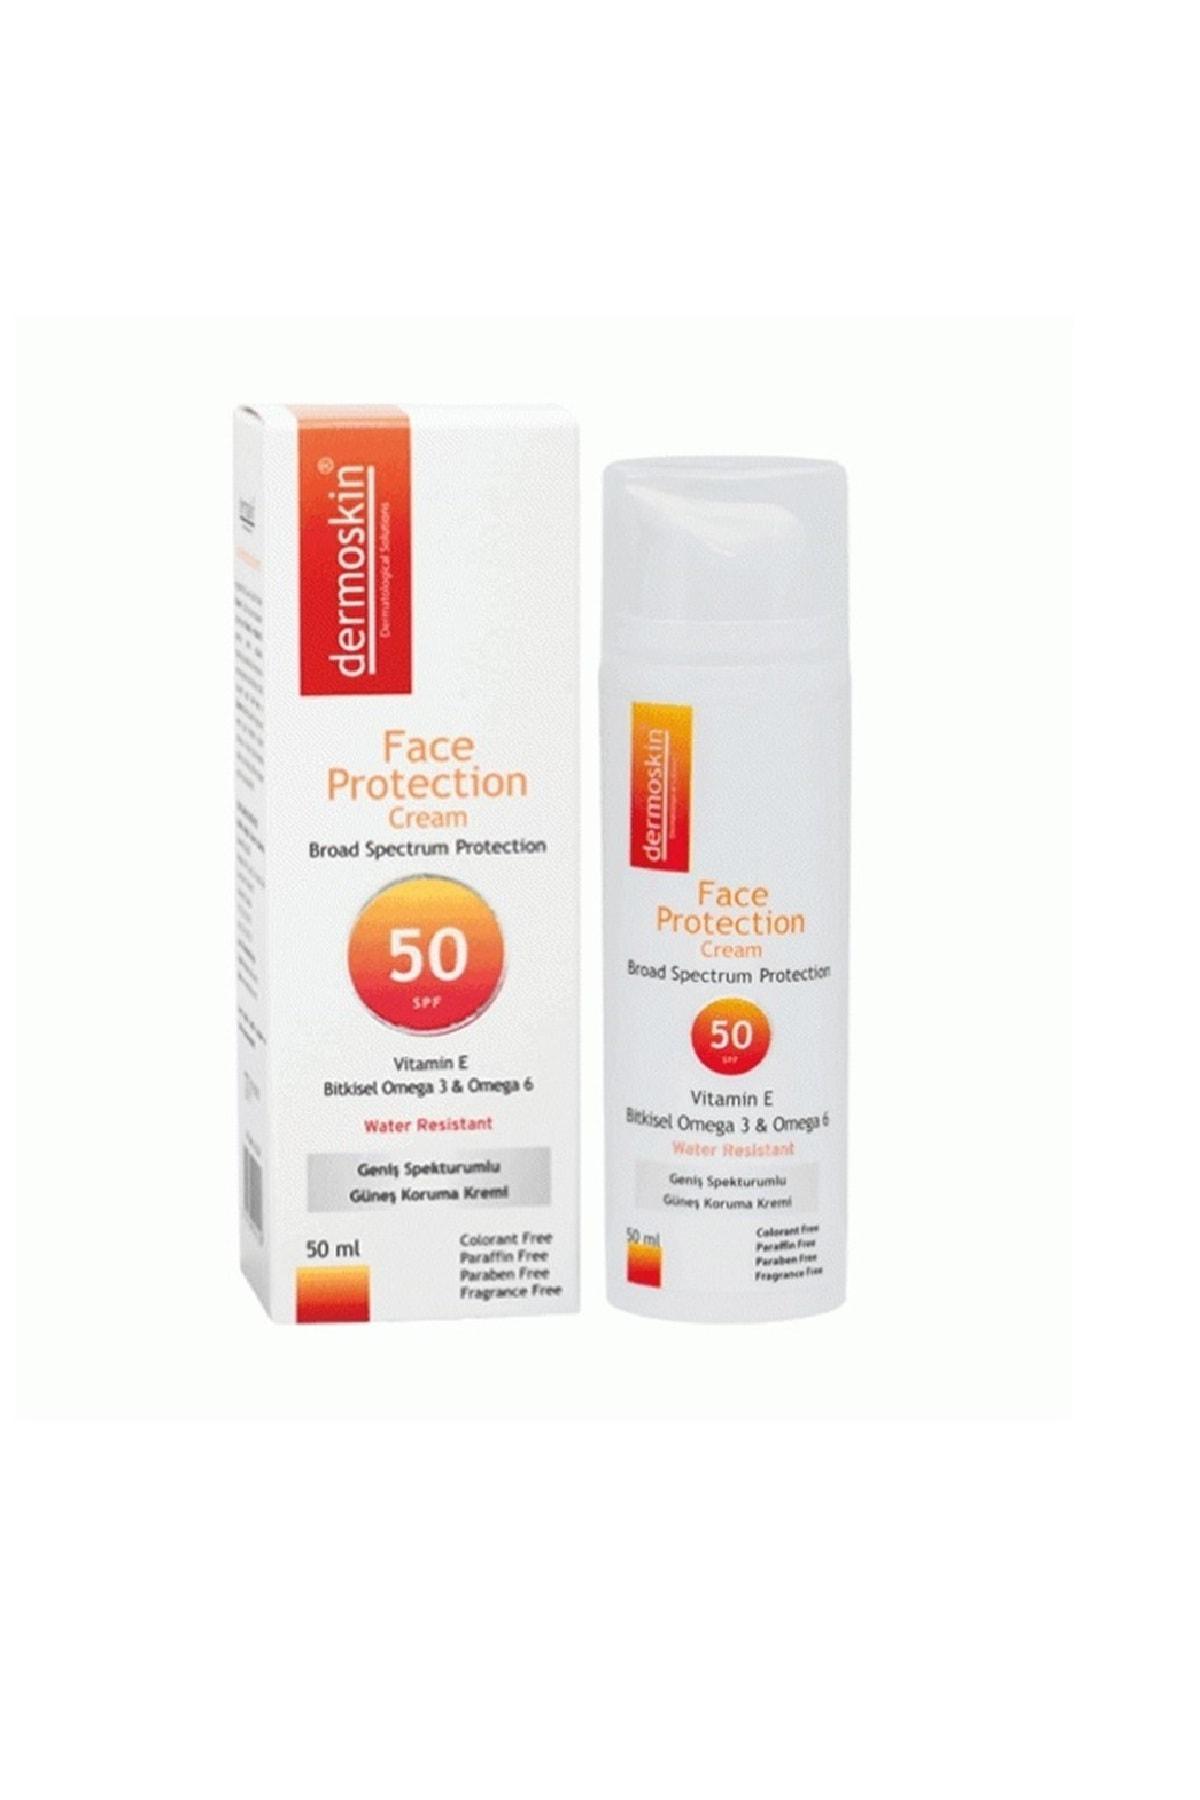 Dermoskin Face Protection Kremi Spf 50+ 1